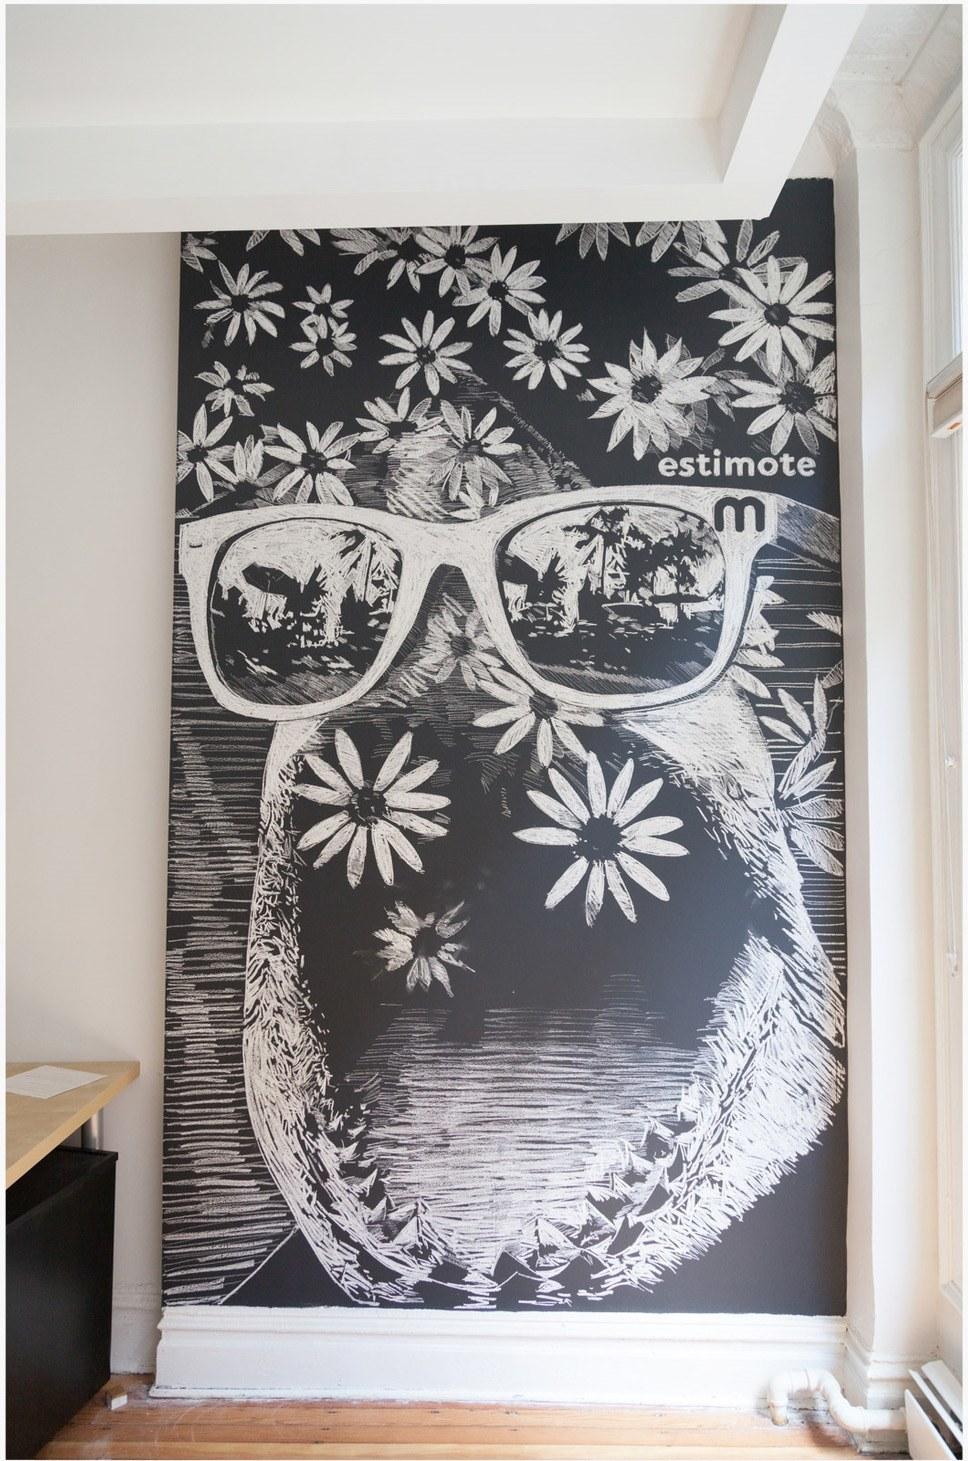 memoir-estimote-new-york-office-10